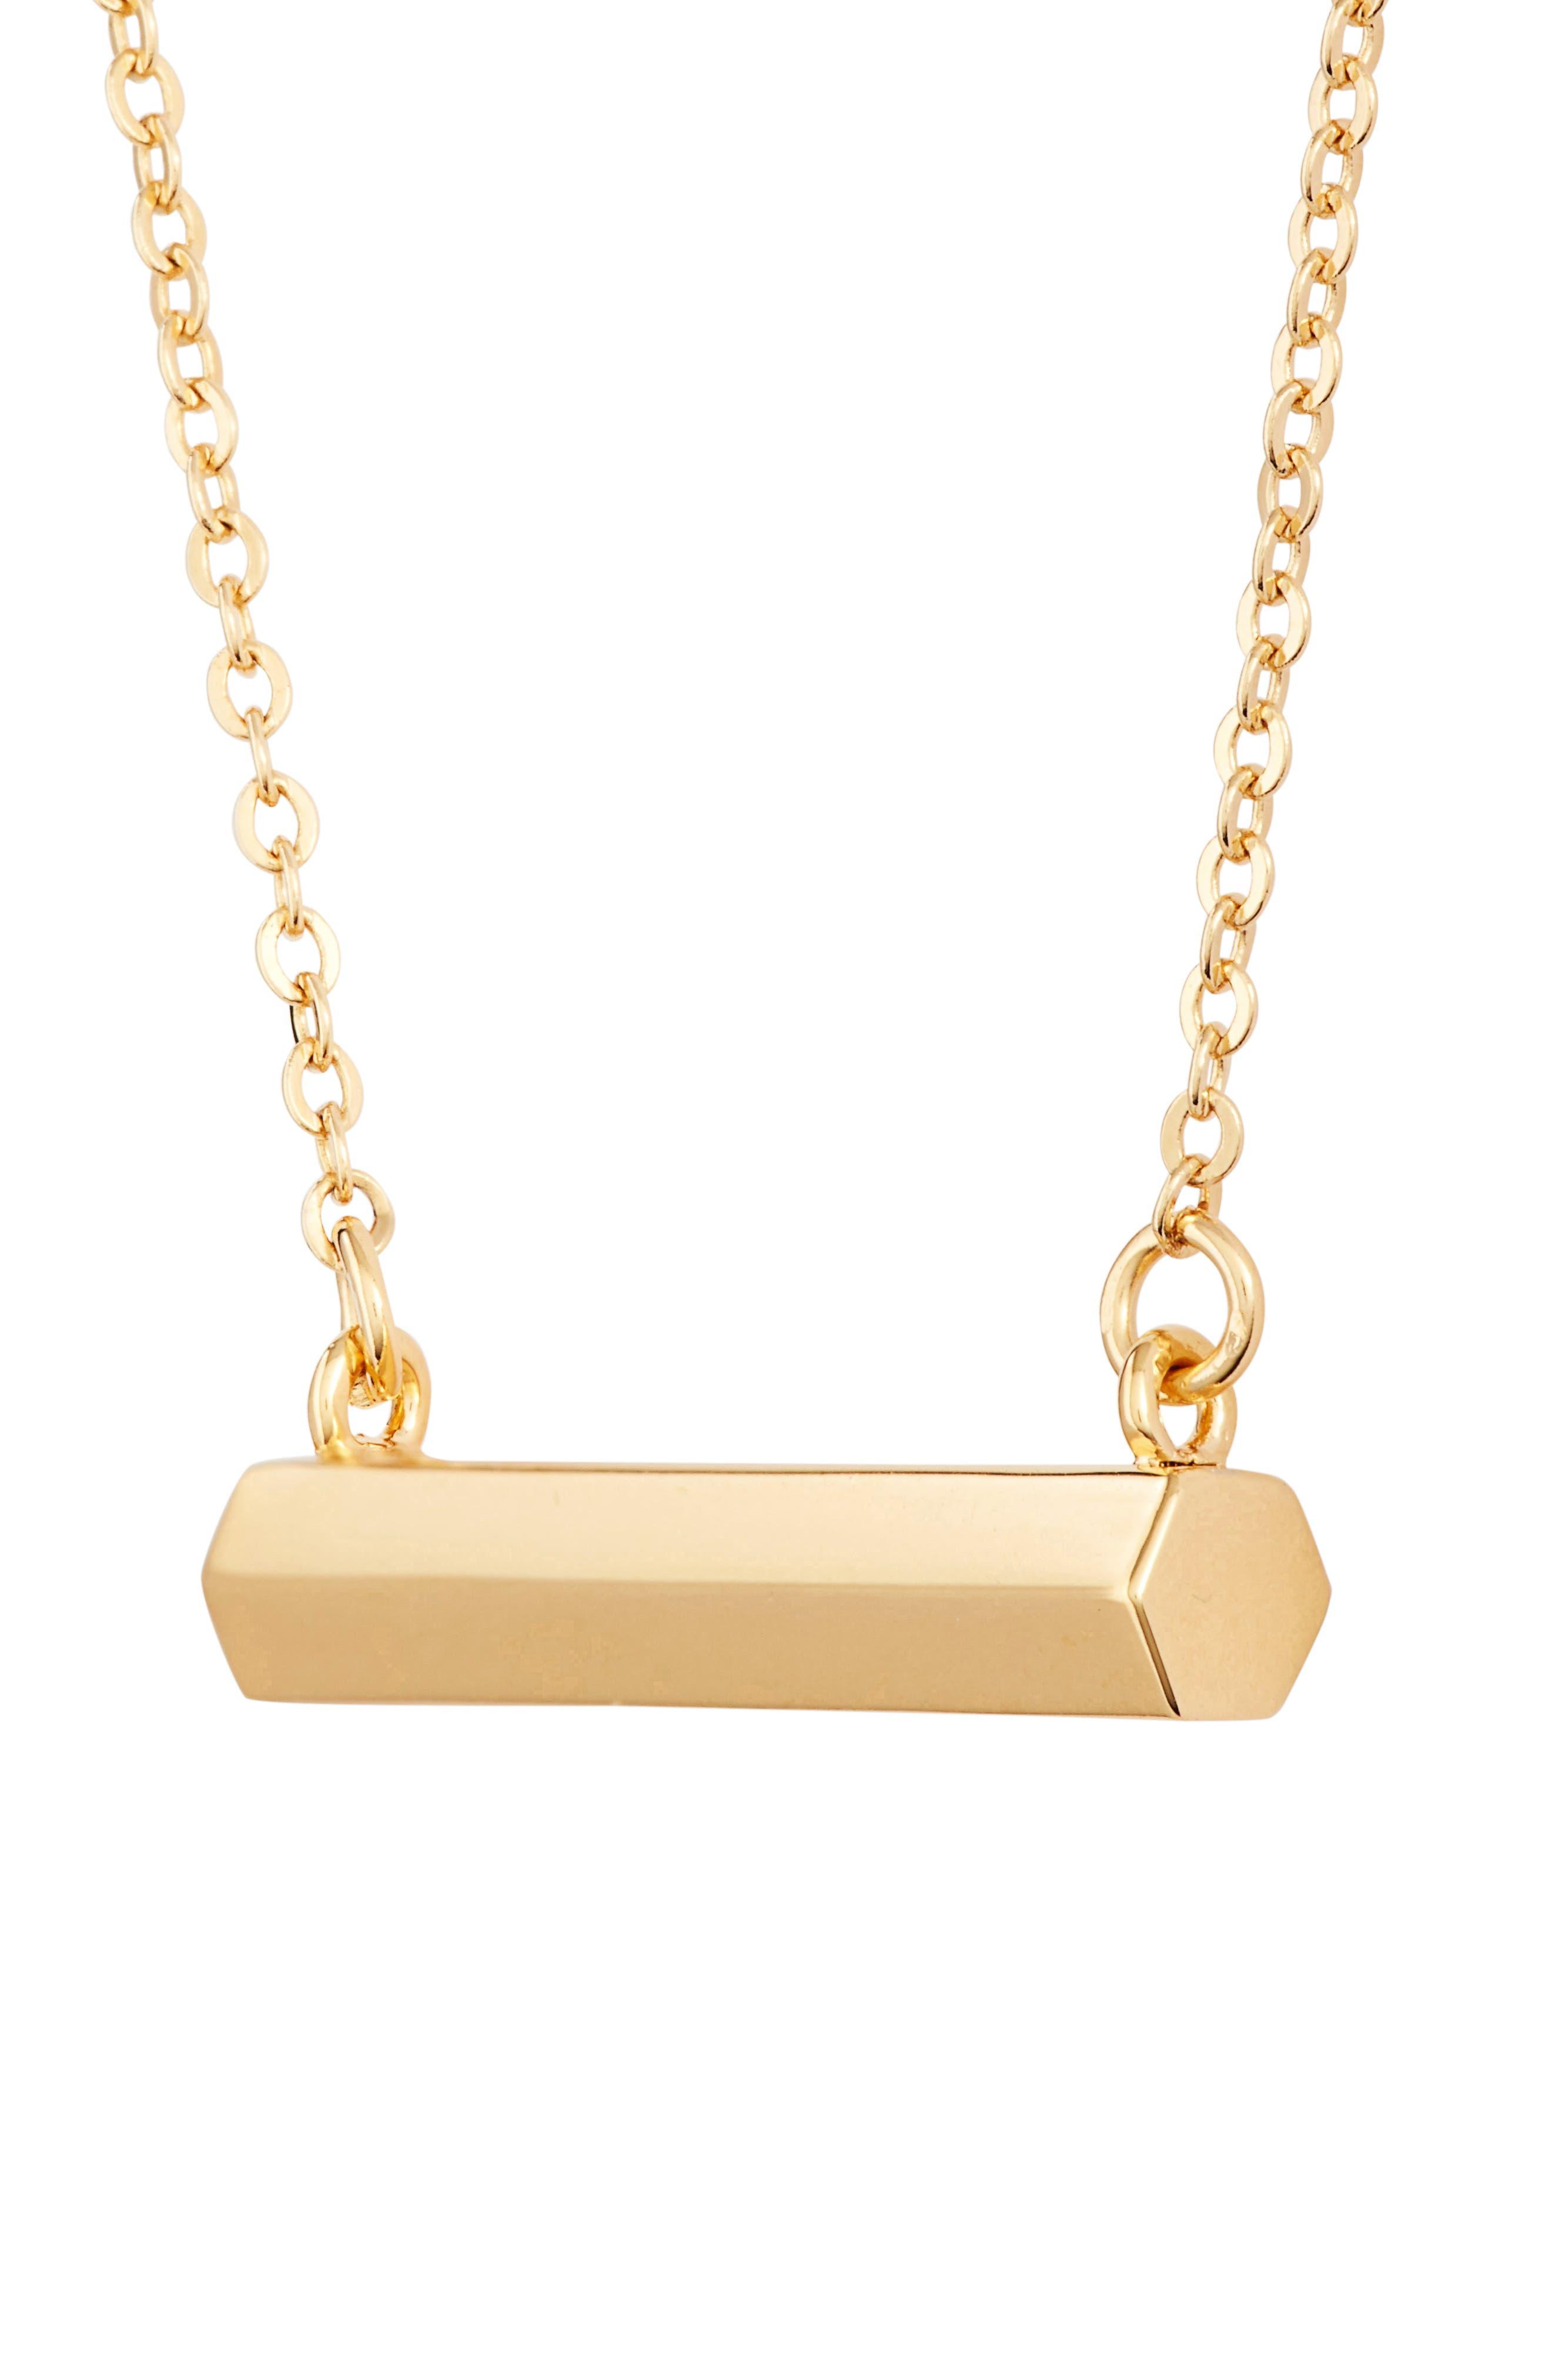 Hexagon Shaped Bar Pendant Necklace,                             Alternate thumbnail 3, color,                             Gold